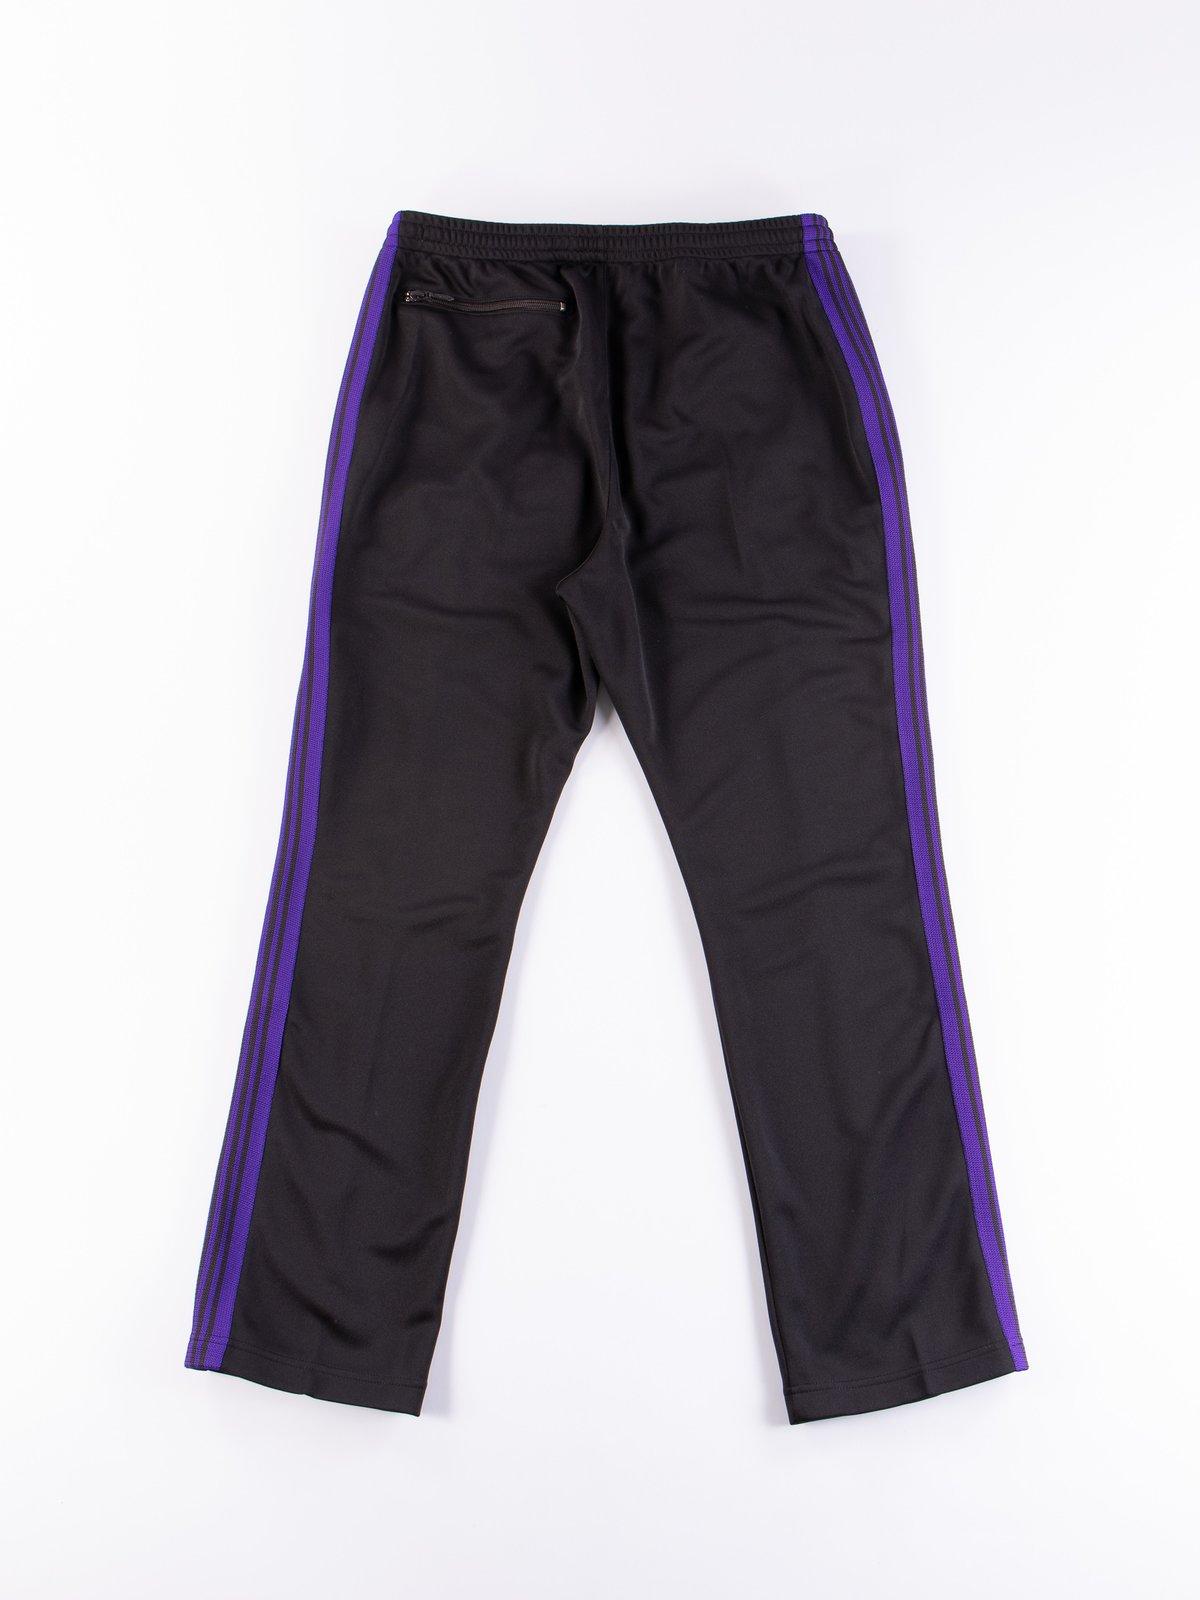 Charcoal Narrow Track Pant - Image 5